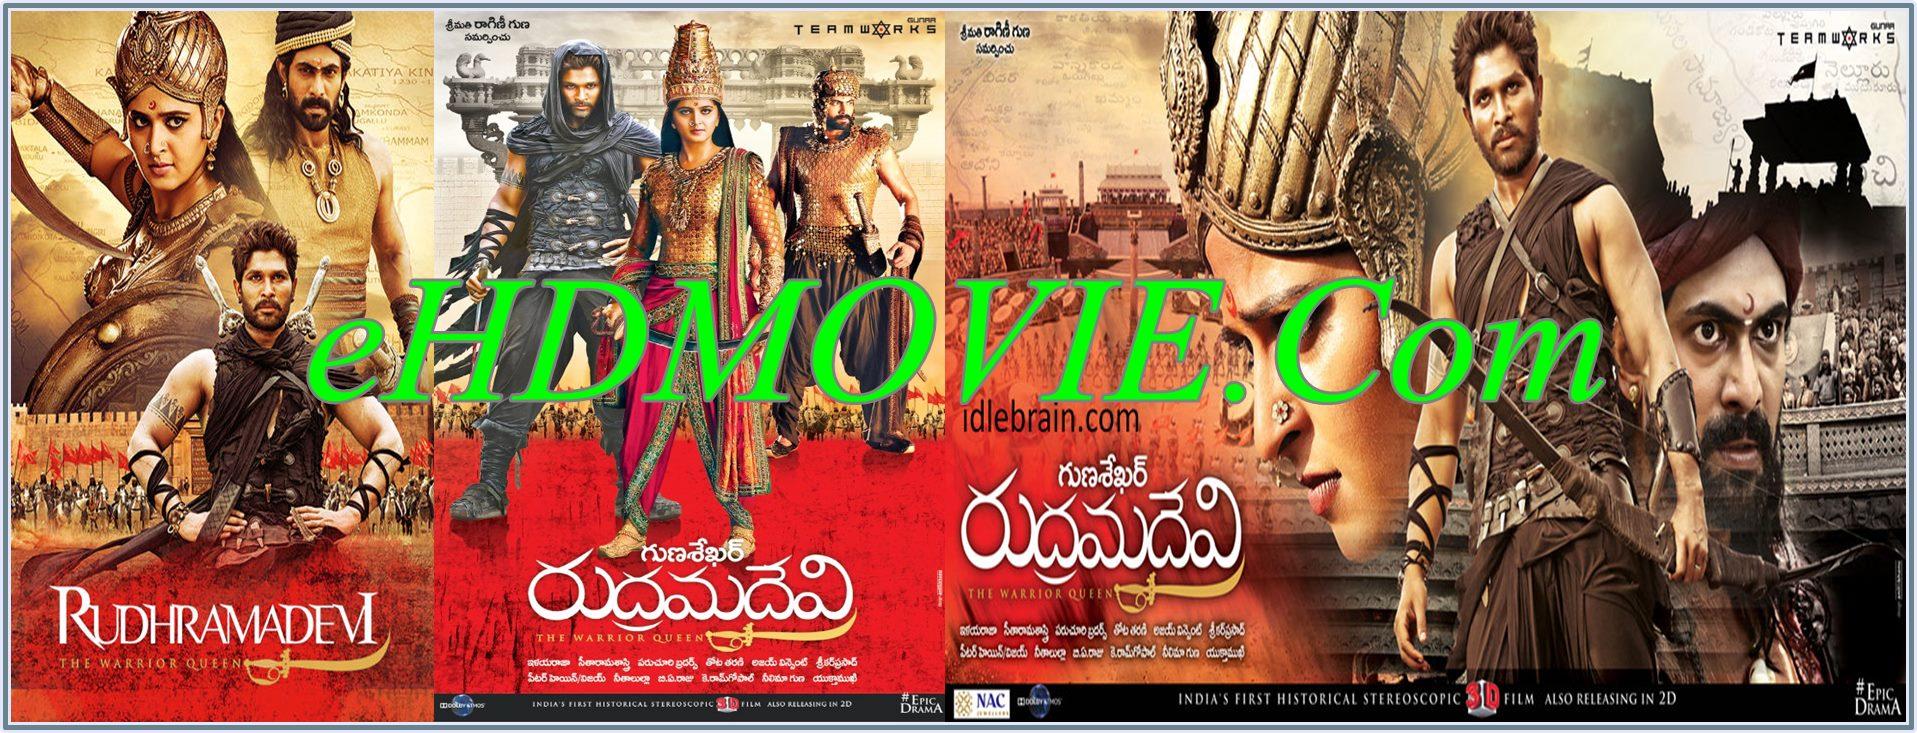 Rudhramadevi 2015 Full Movie Dual Audio [Hindi – Telugu] 720p - 480p ORG BRRip 450MB - 850MB ESubs Free Download